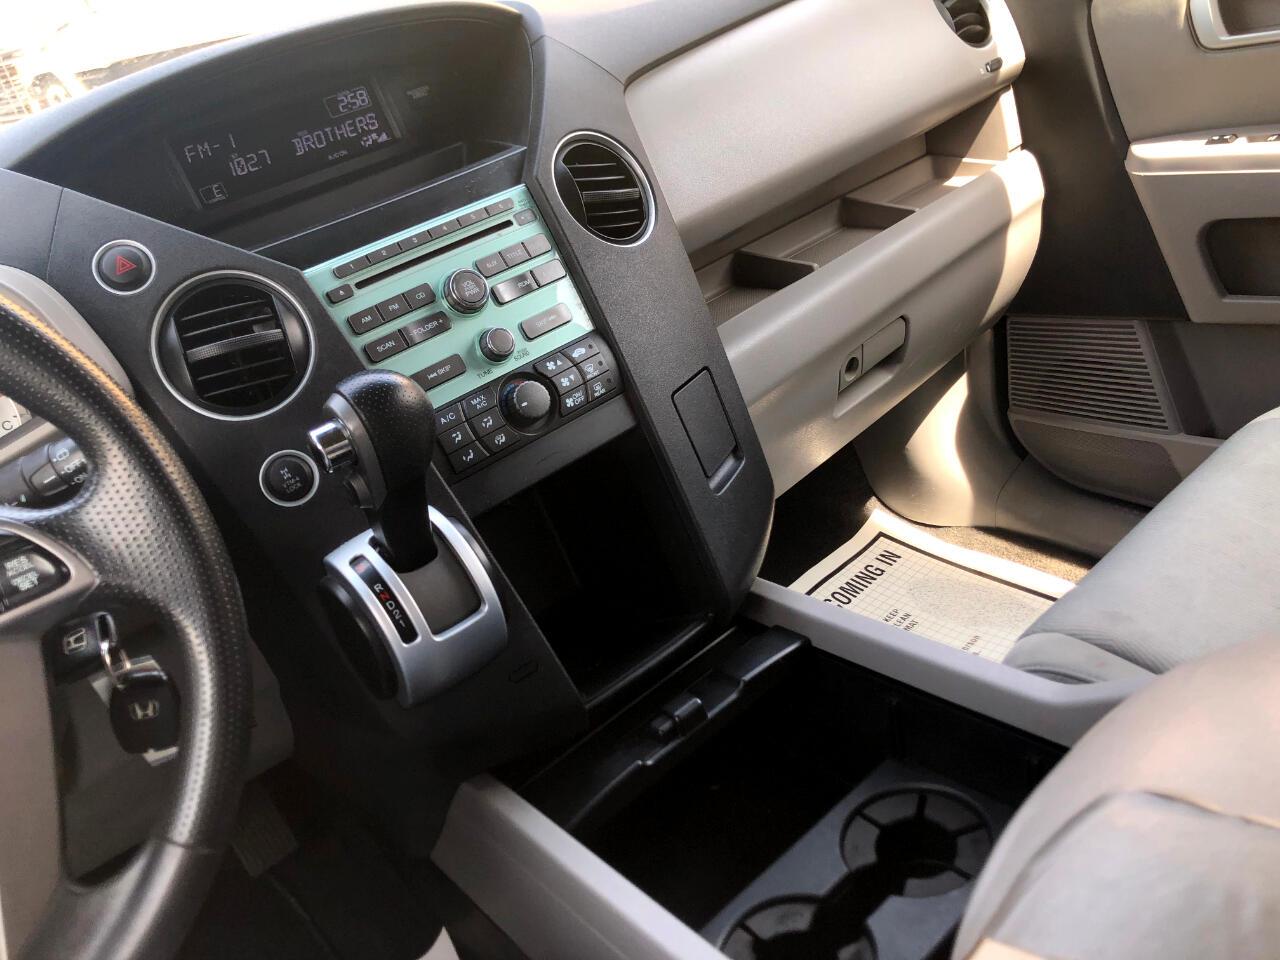 2011 Honda Pilot 4WD 4dr LX